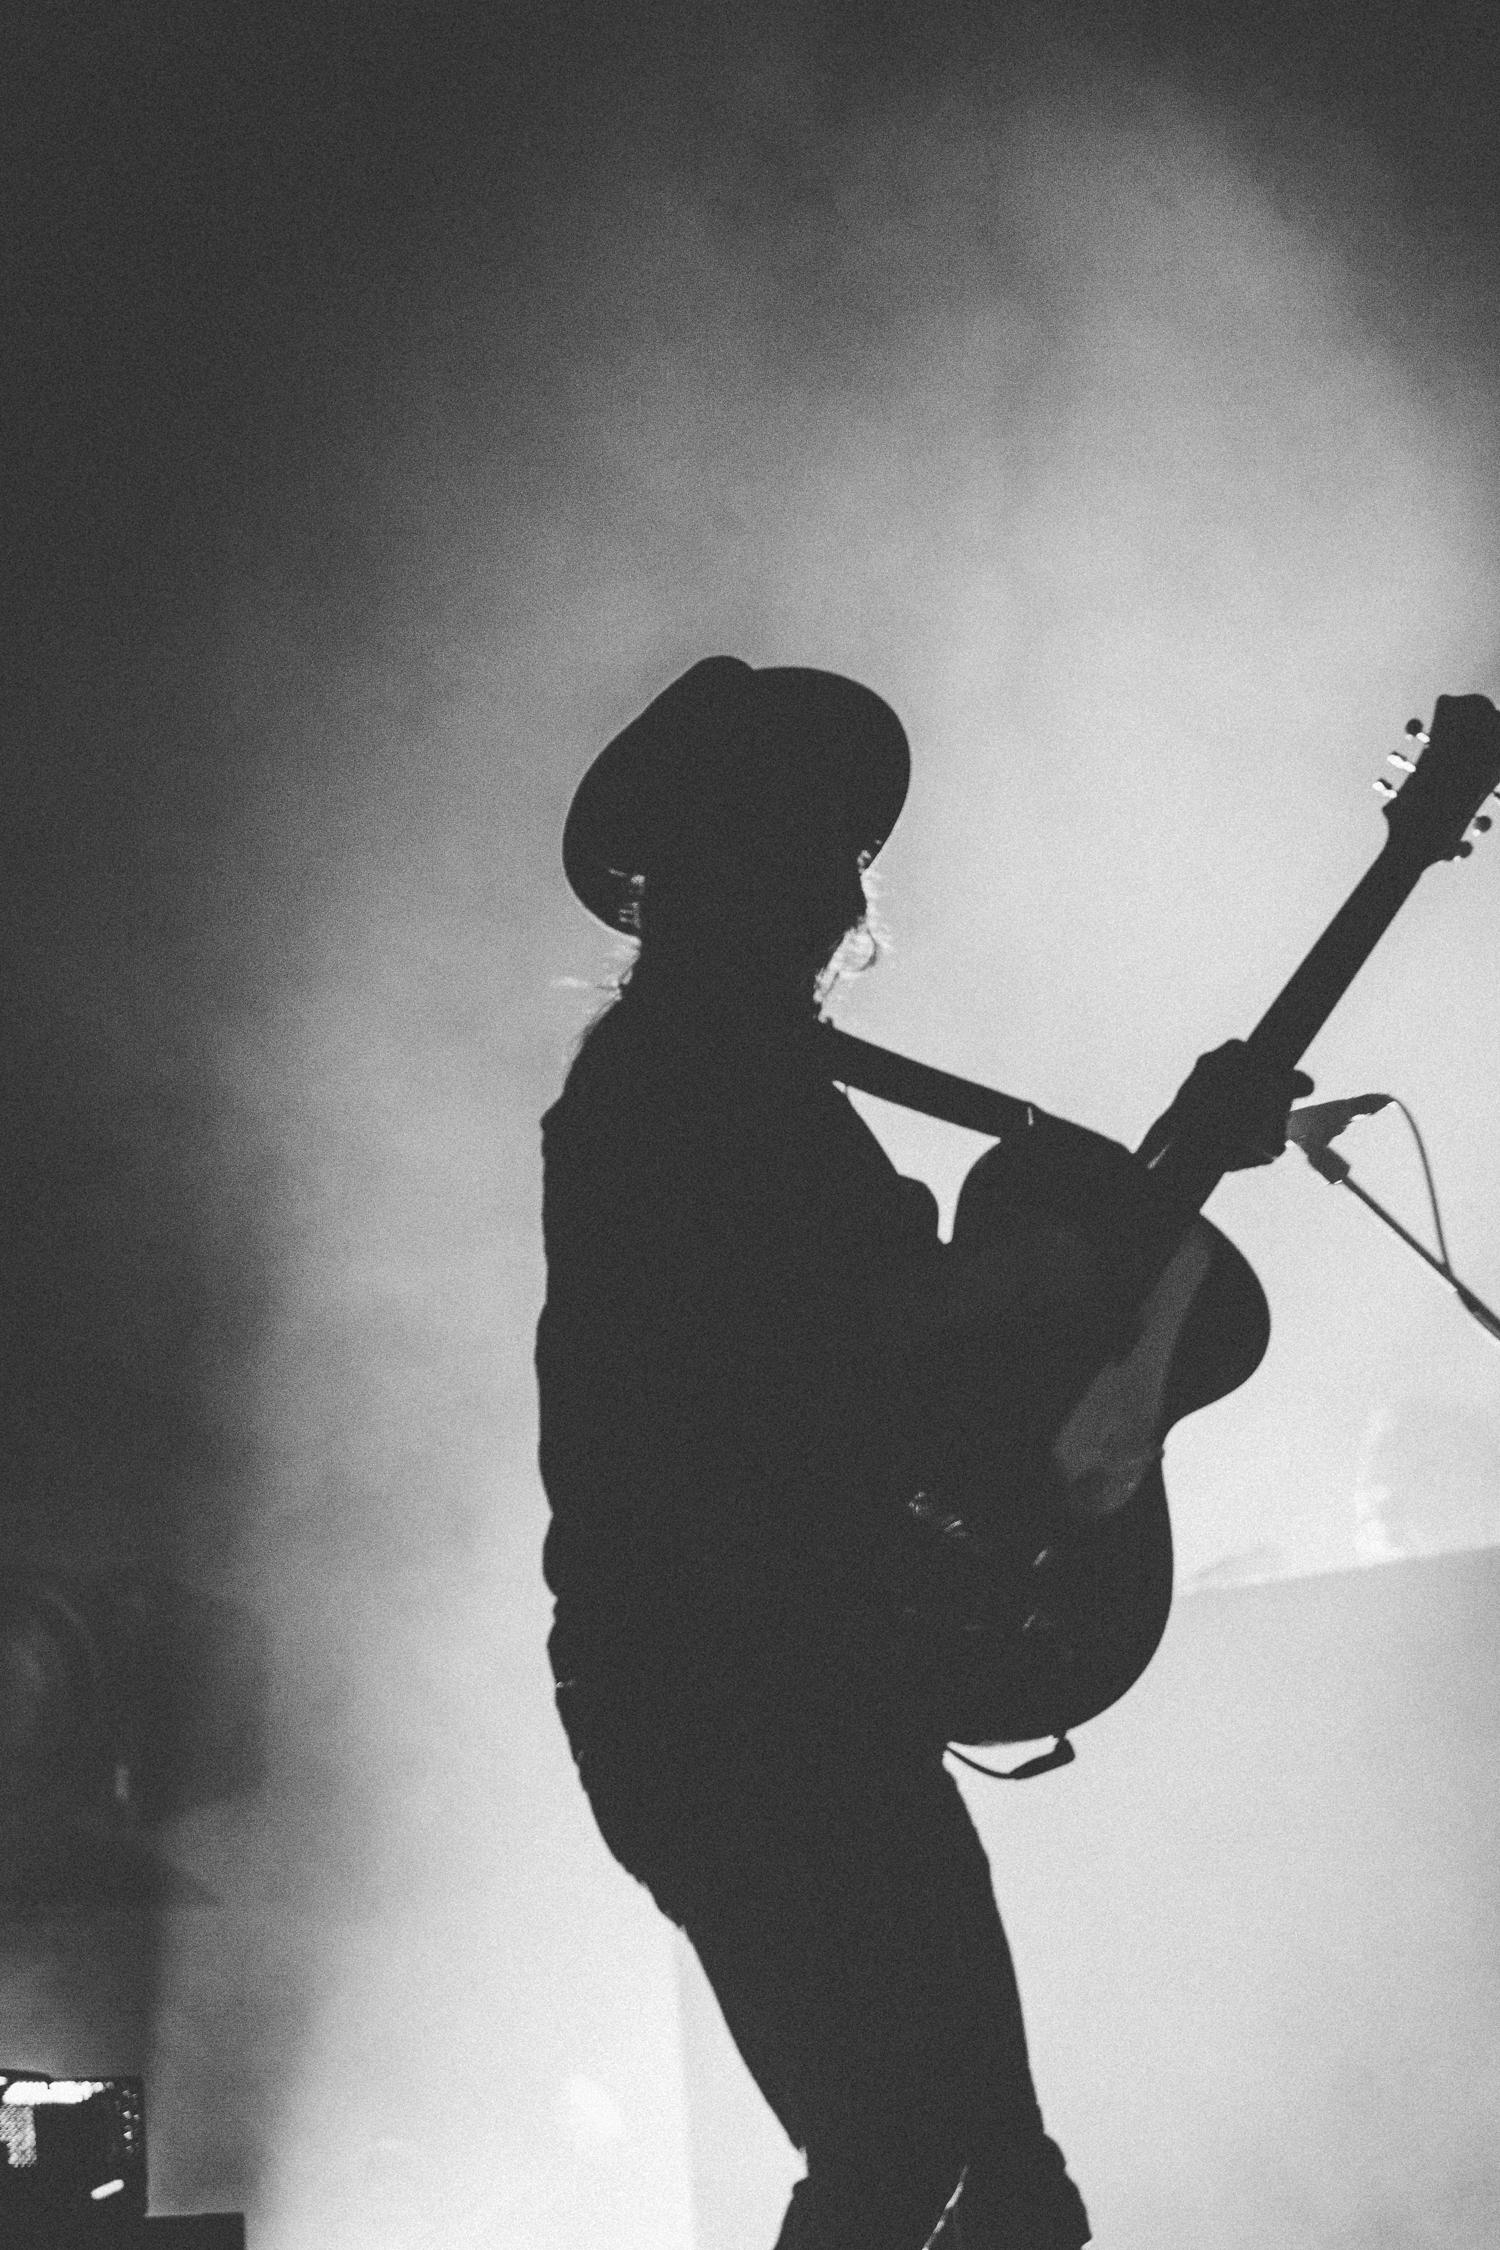 James-Bay-Live-Boardmasters-Music-Concert-Darina-Stoda-Photography-Photographer-3.jpg